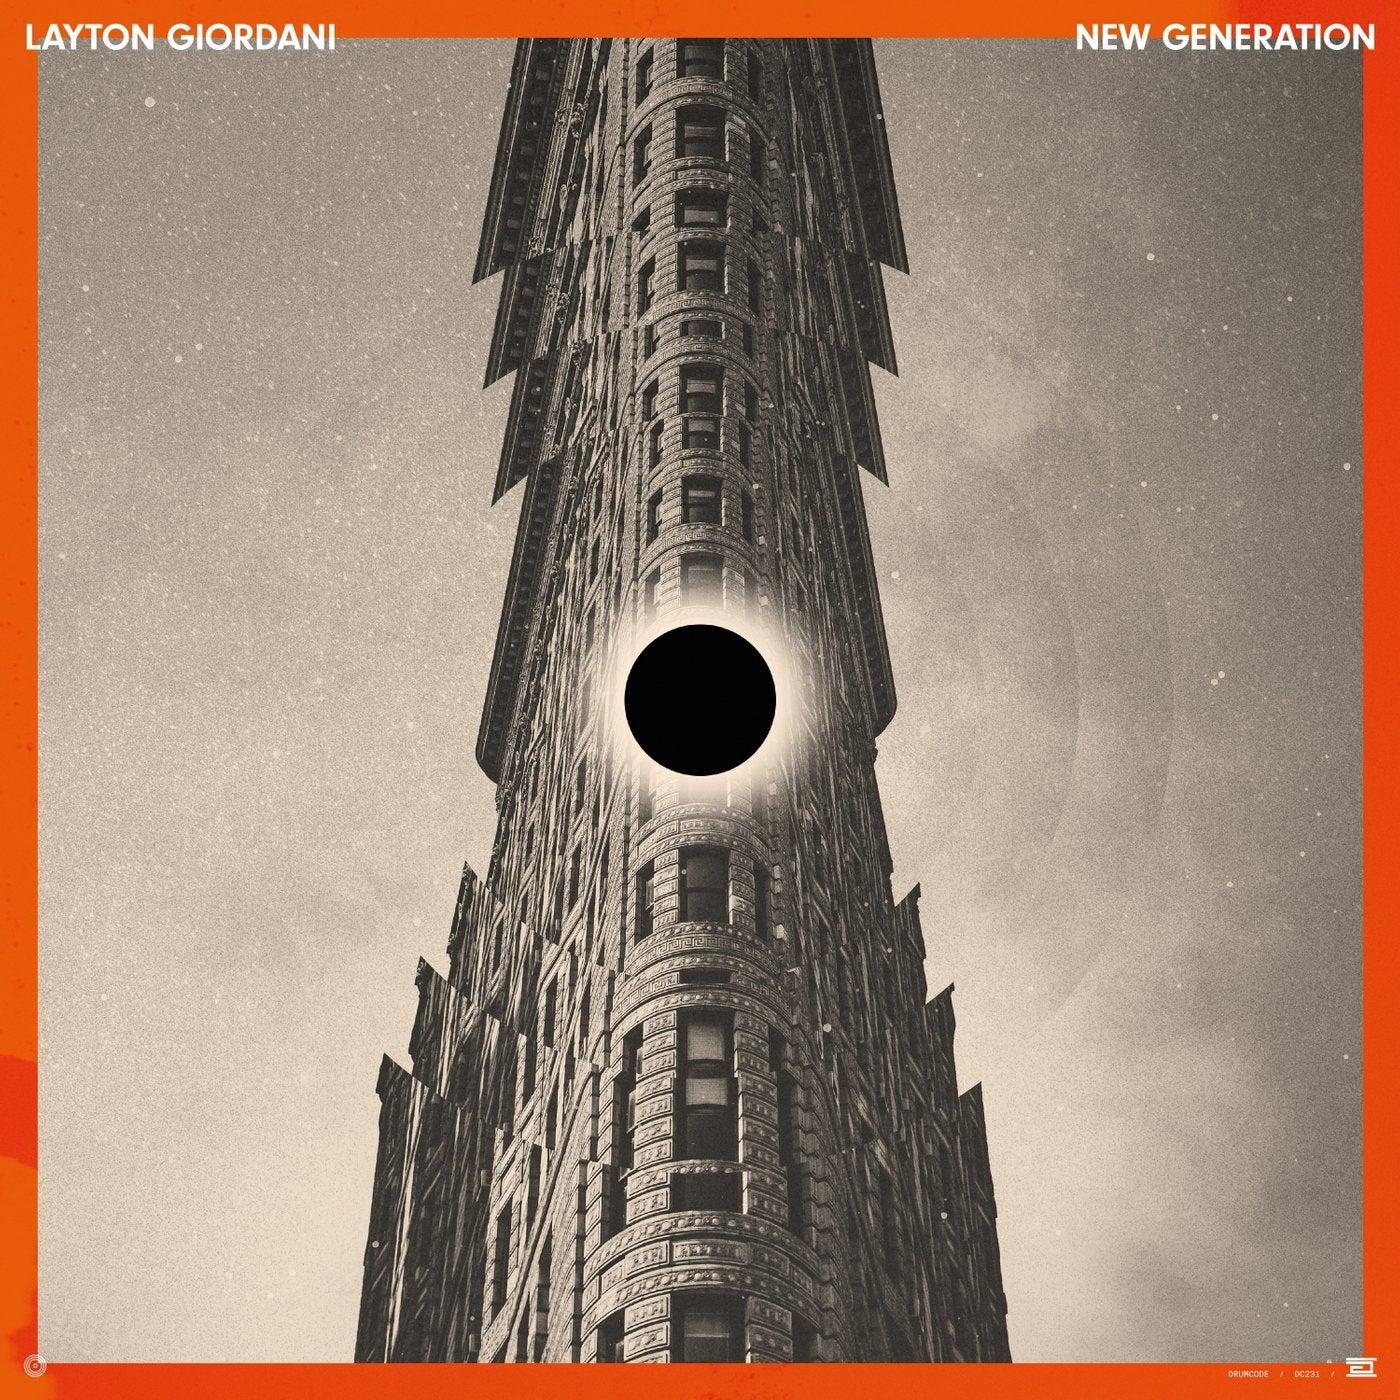 New Generation (Original Mix)